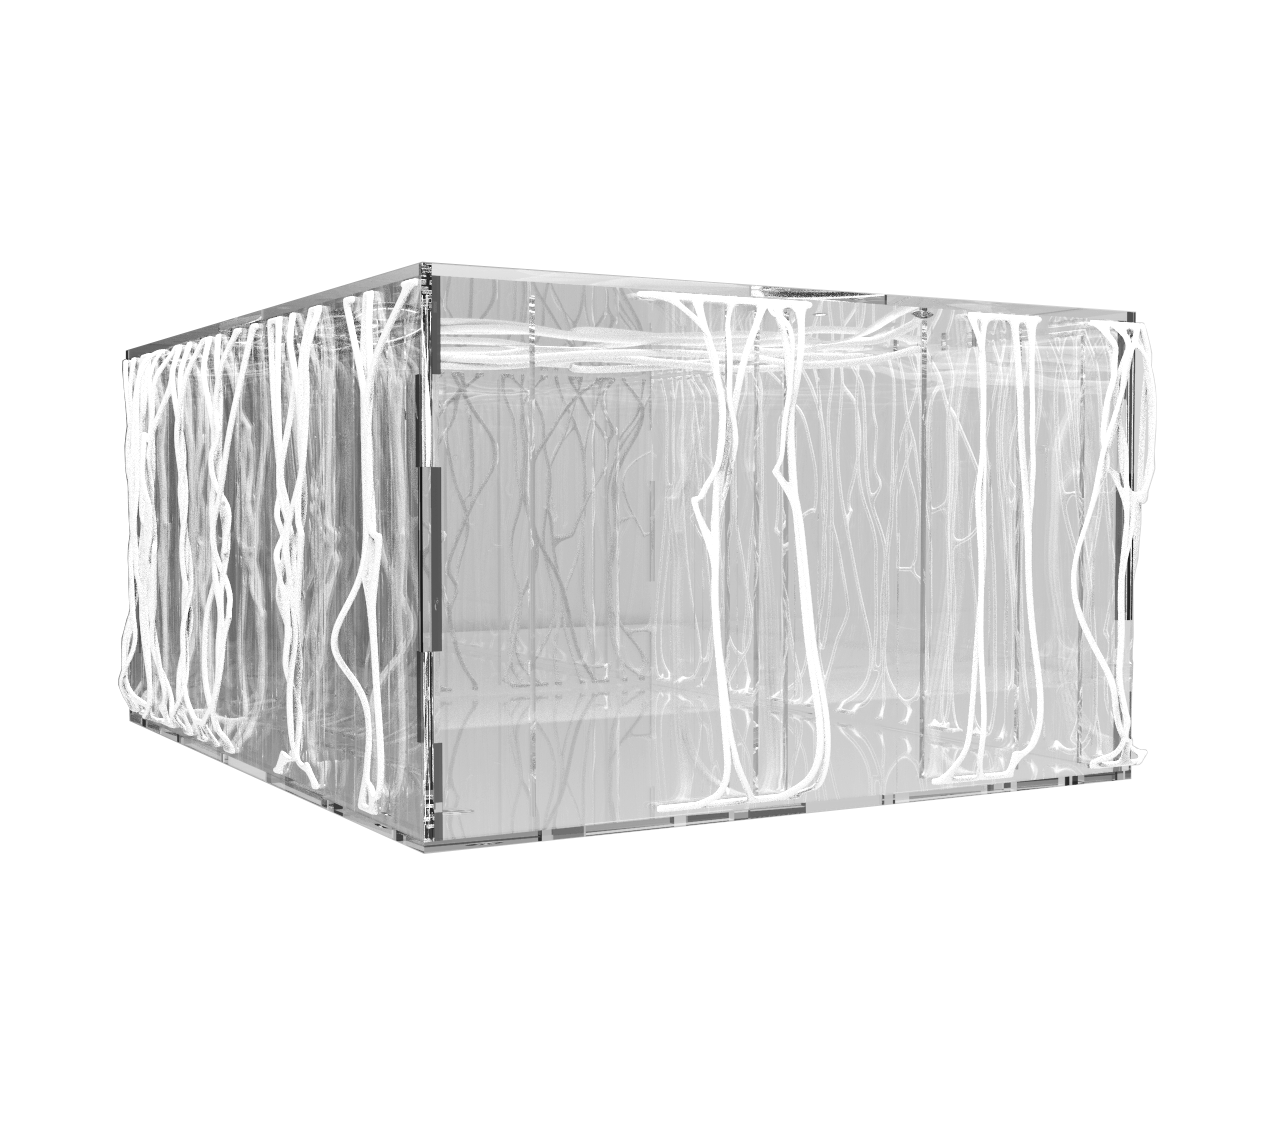 box 2017 - anna janiak studio image 3